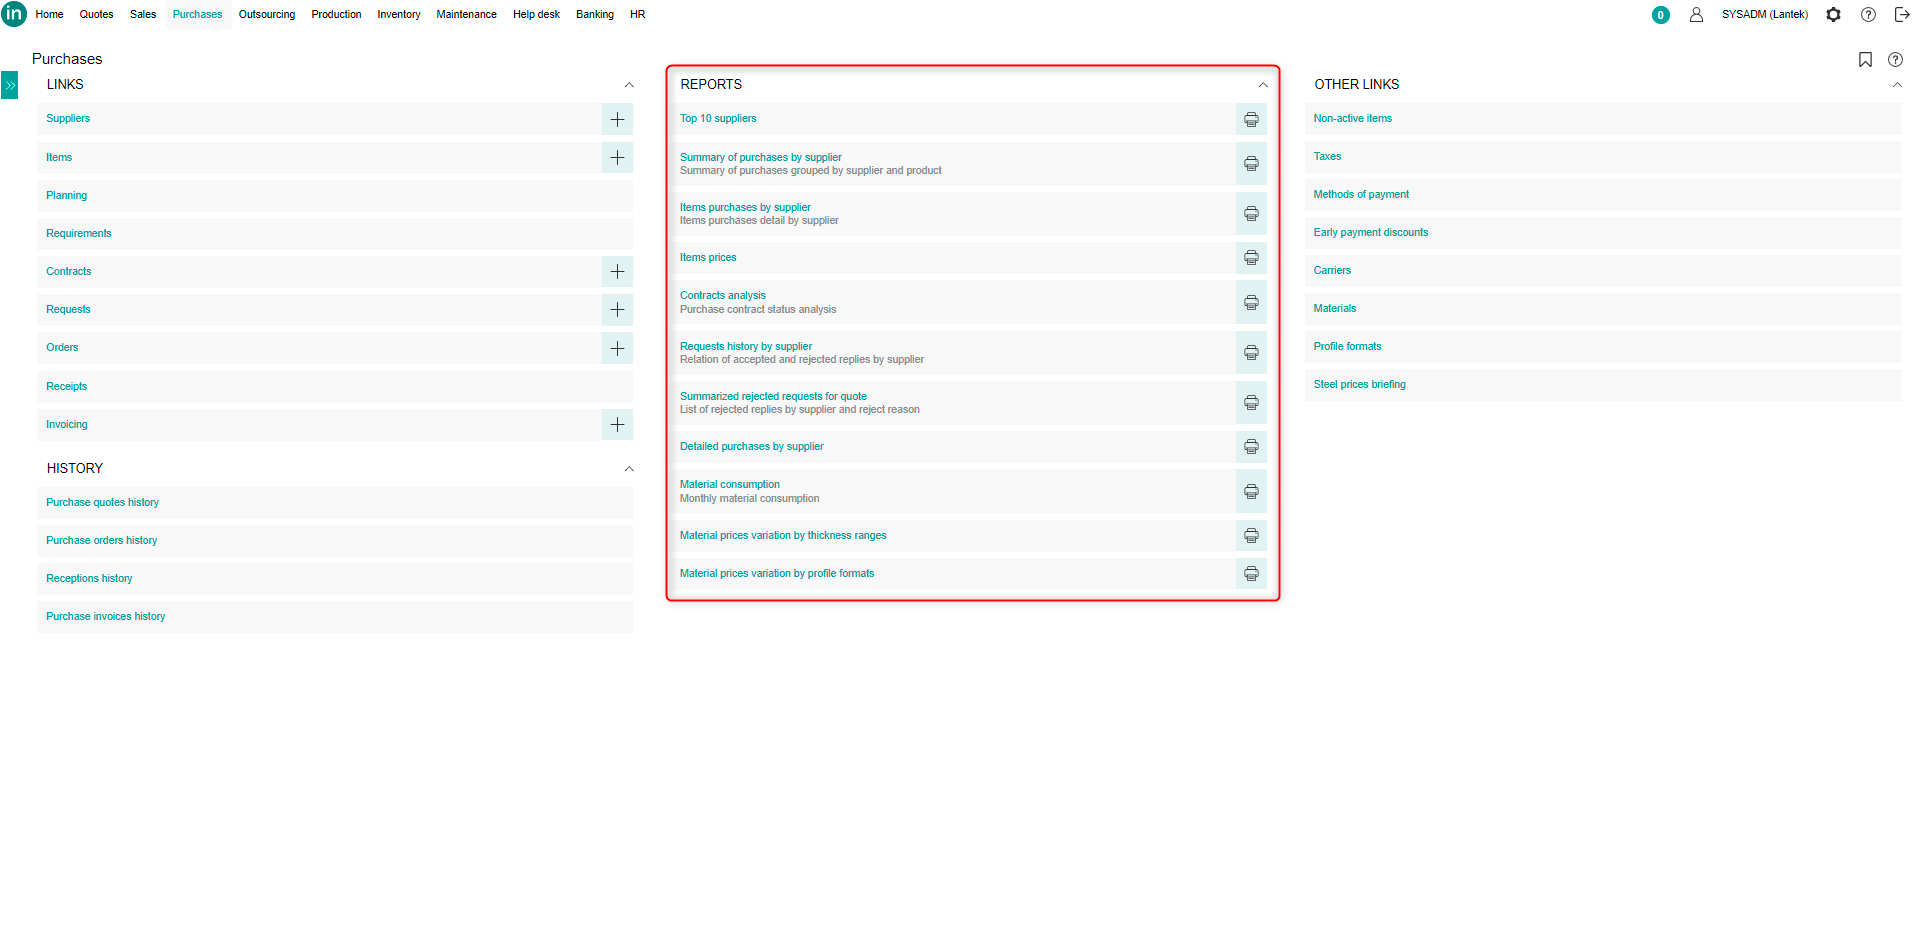 Lantek Integra Purchases  - Indice